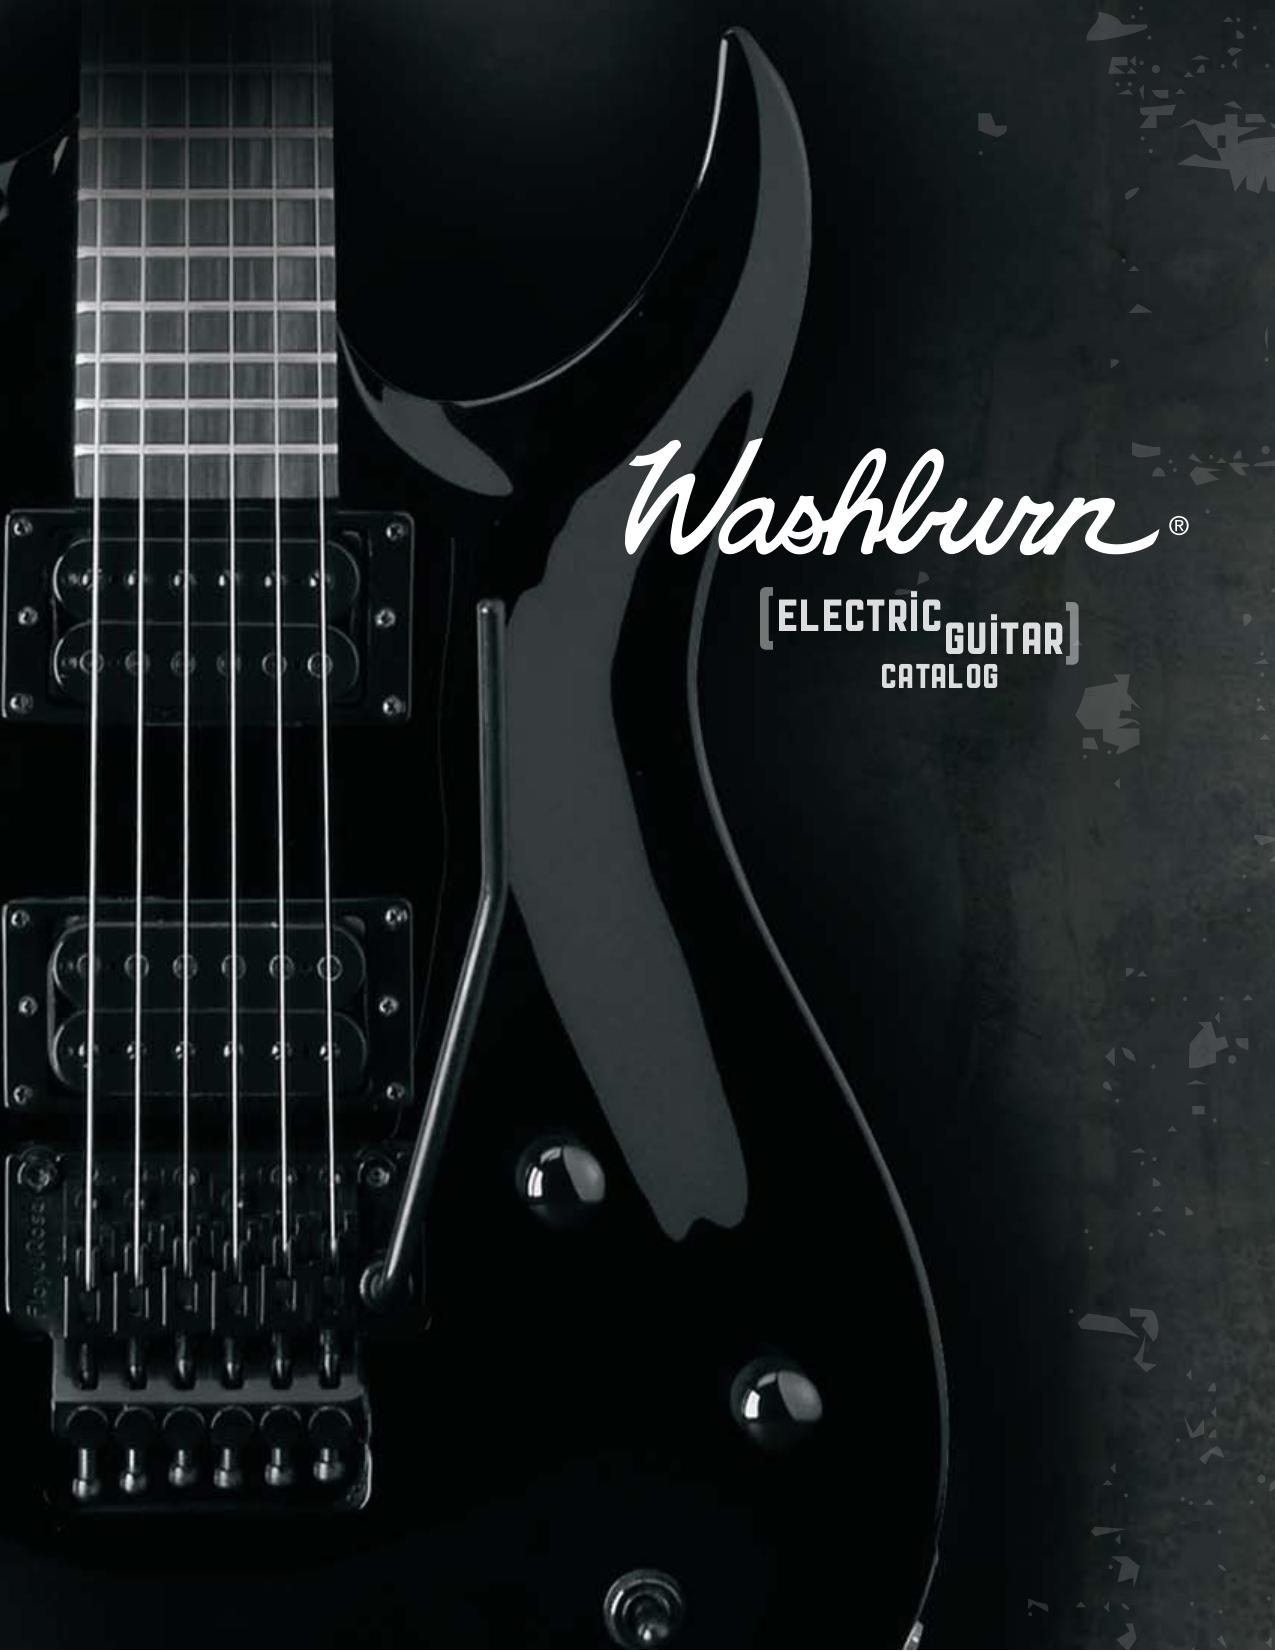 pdf for Washburn Guitar N4ESA manual